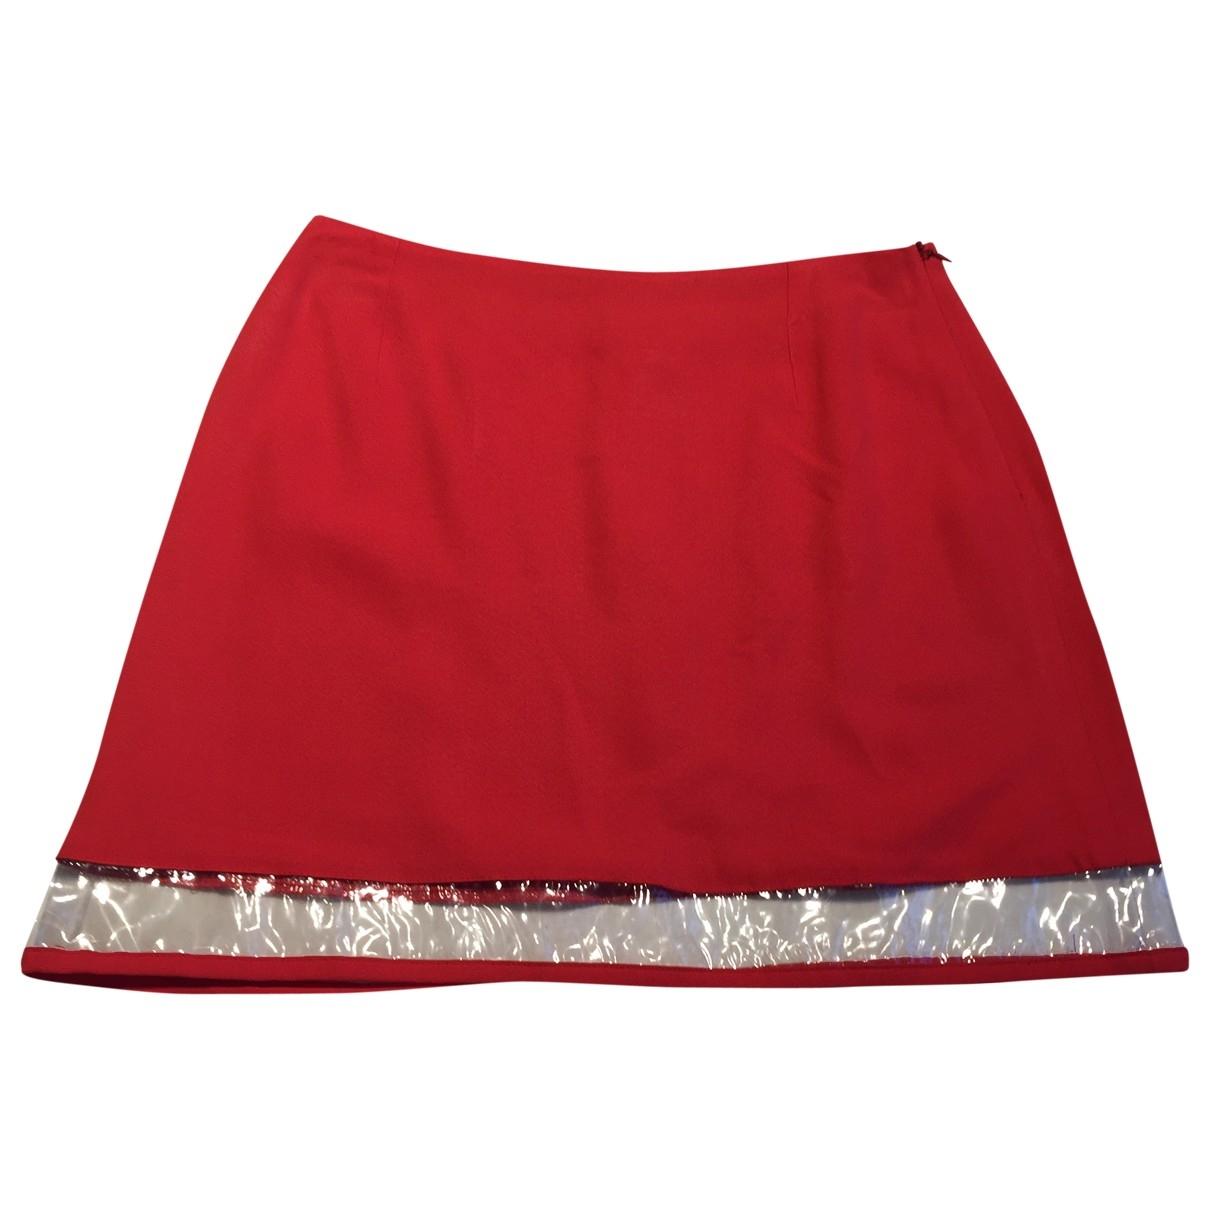 Versus \N Red skirt for Women 40 IT